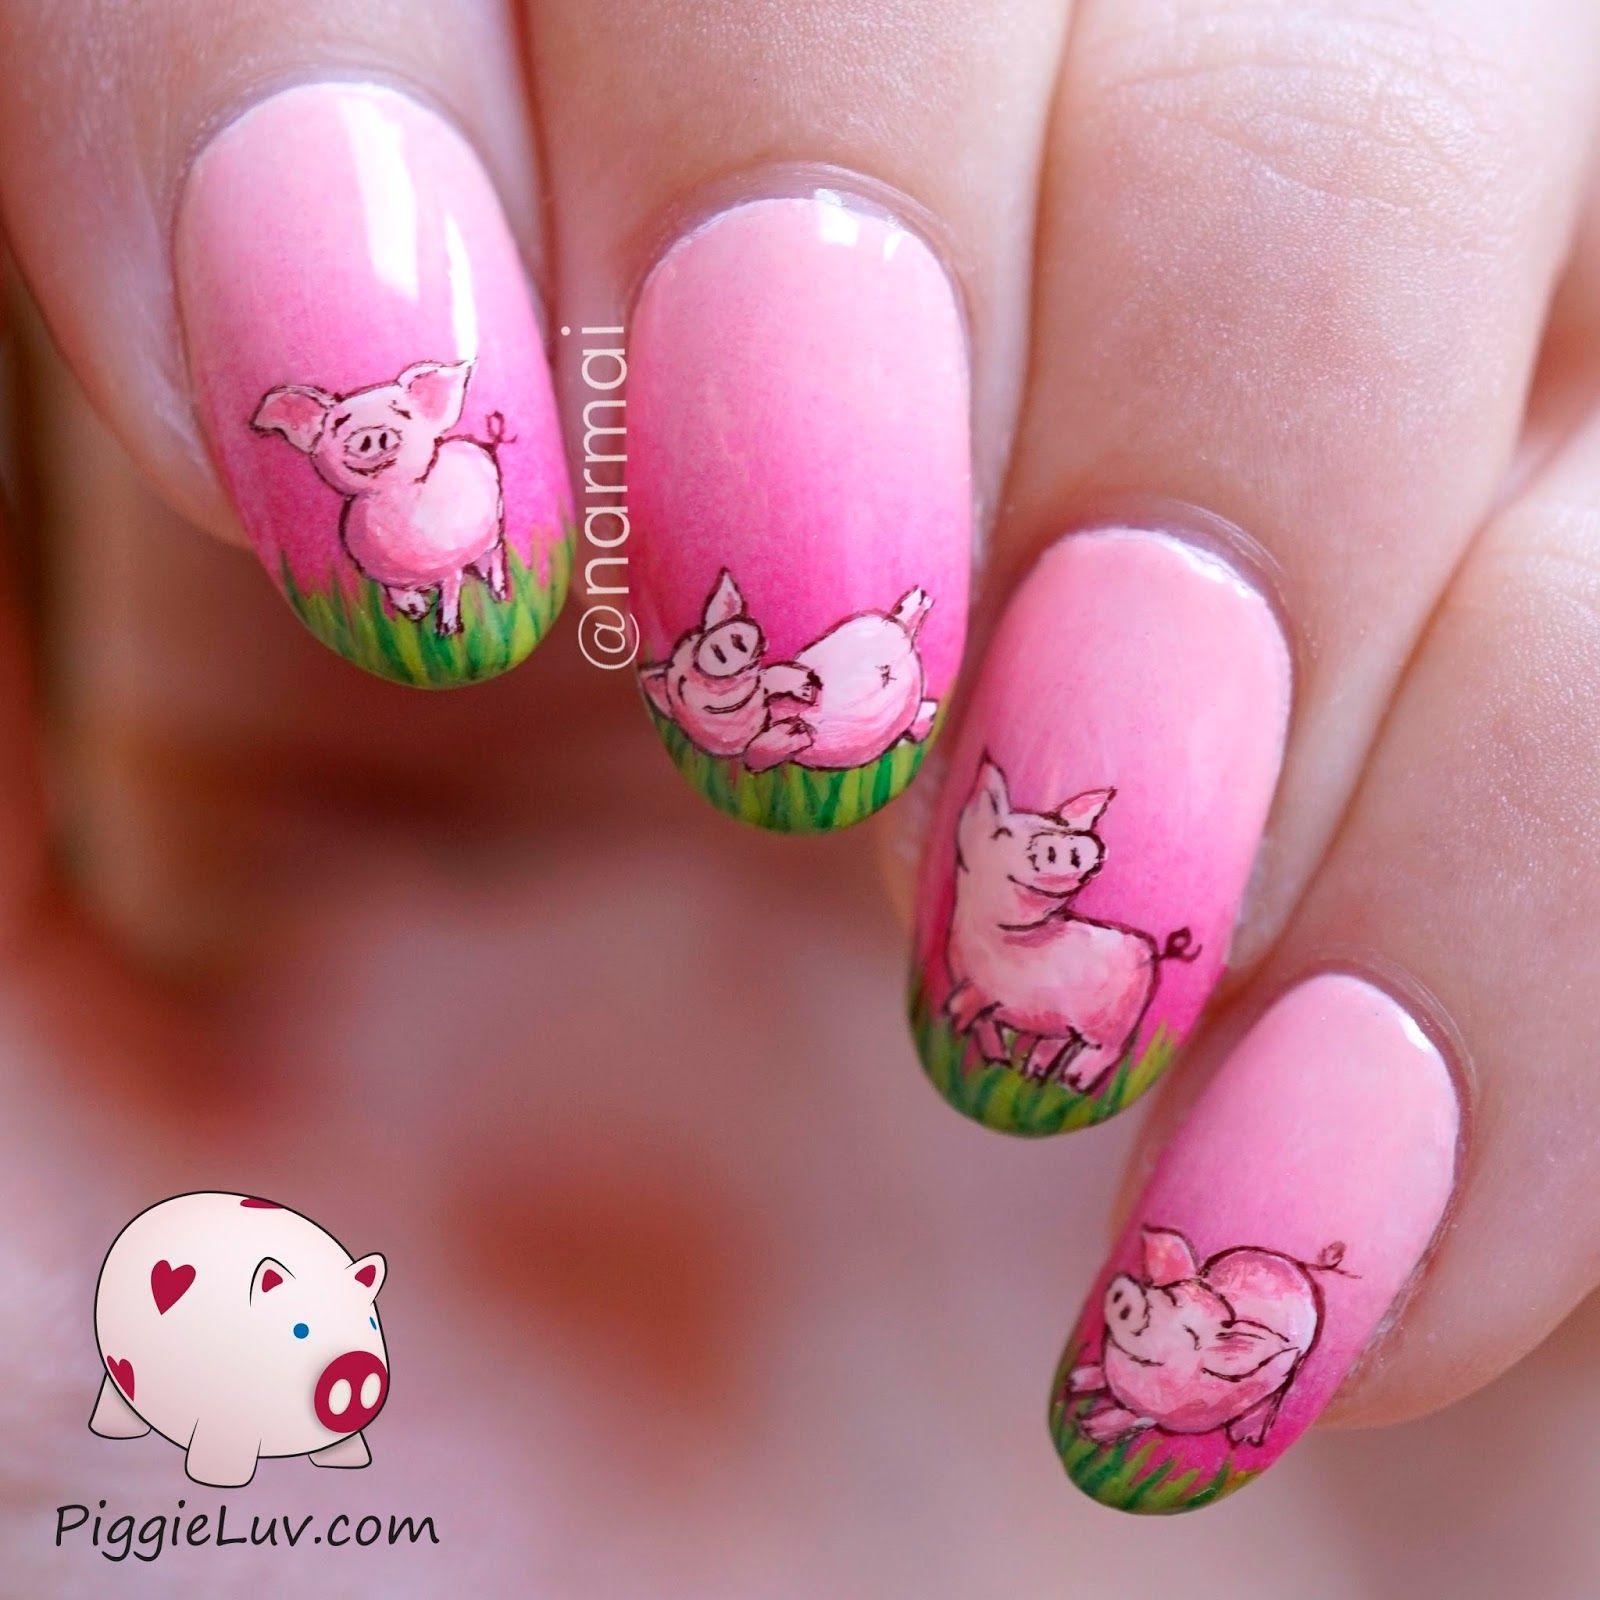 Cute piglet nail art for my 3rd blogiversary! Parteyy!! | Piglets ...